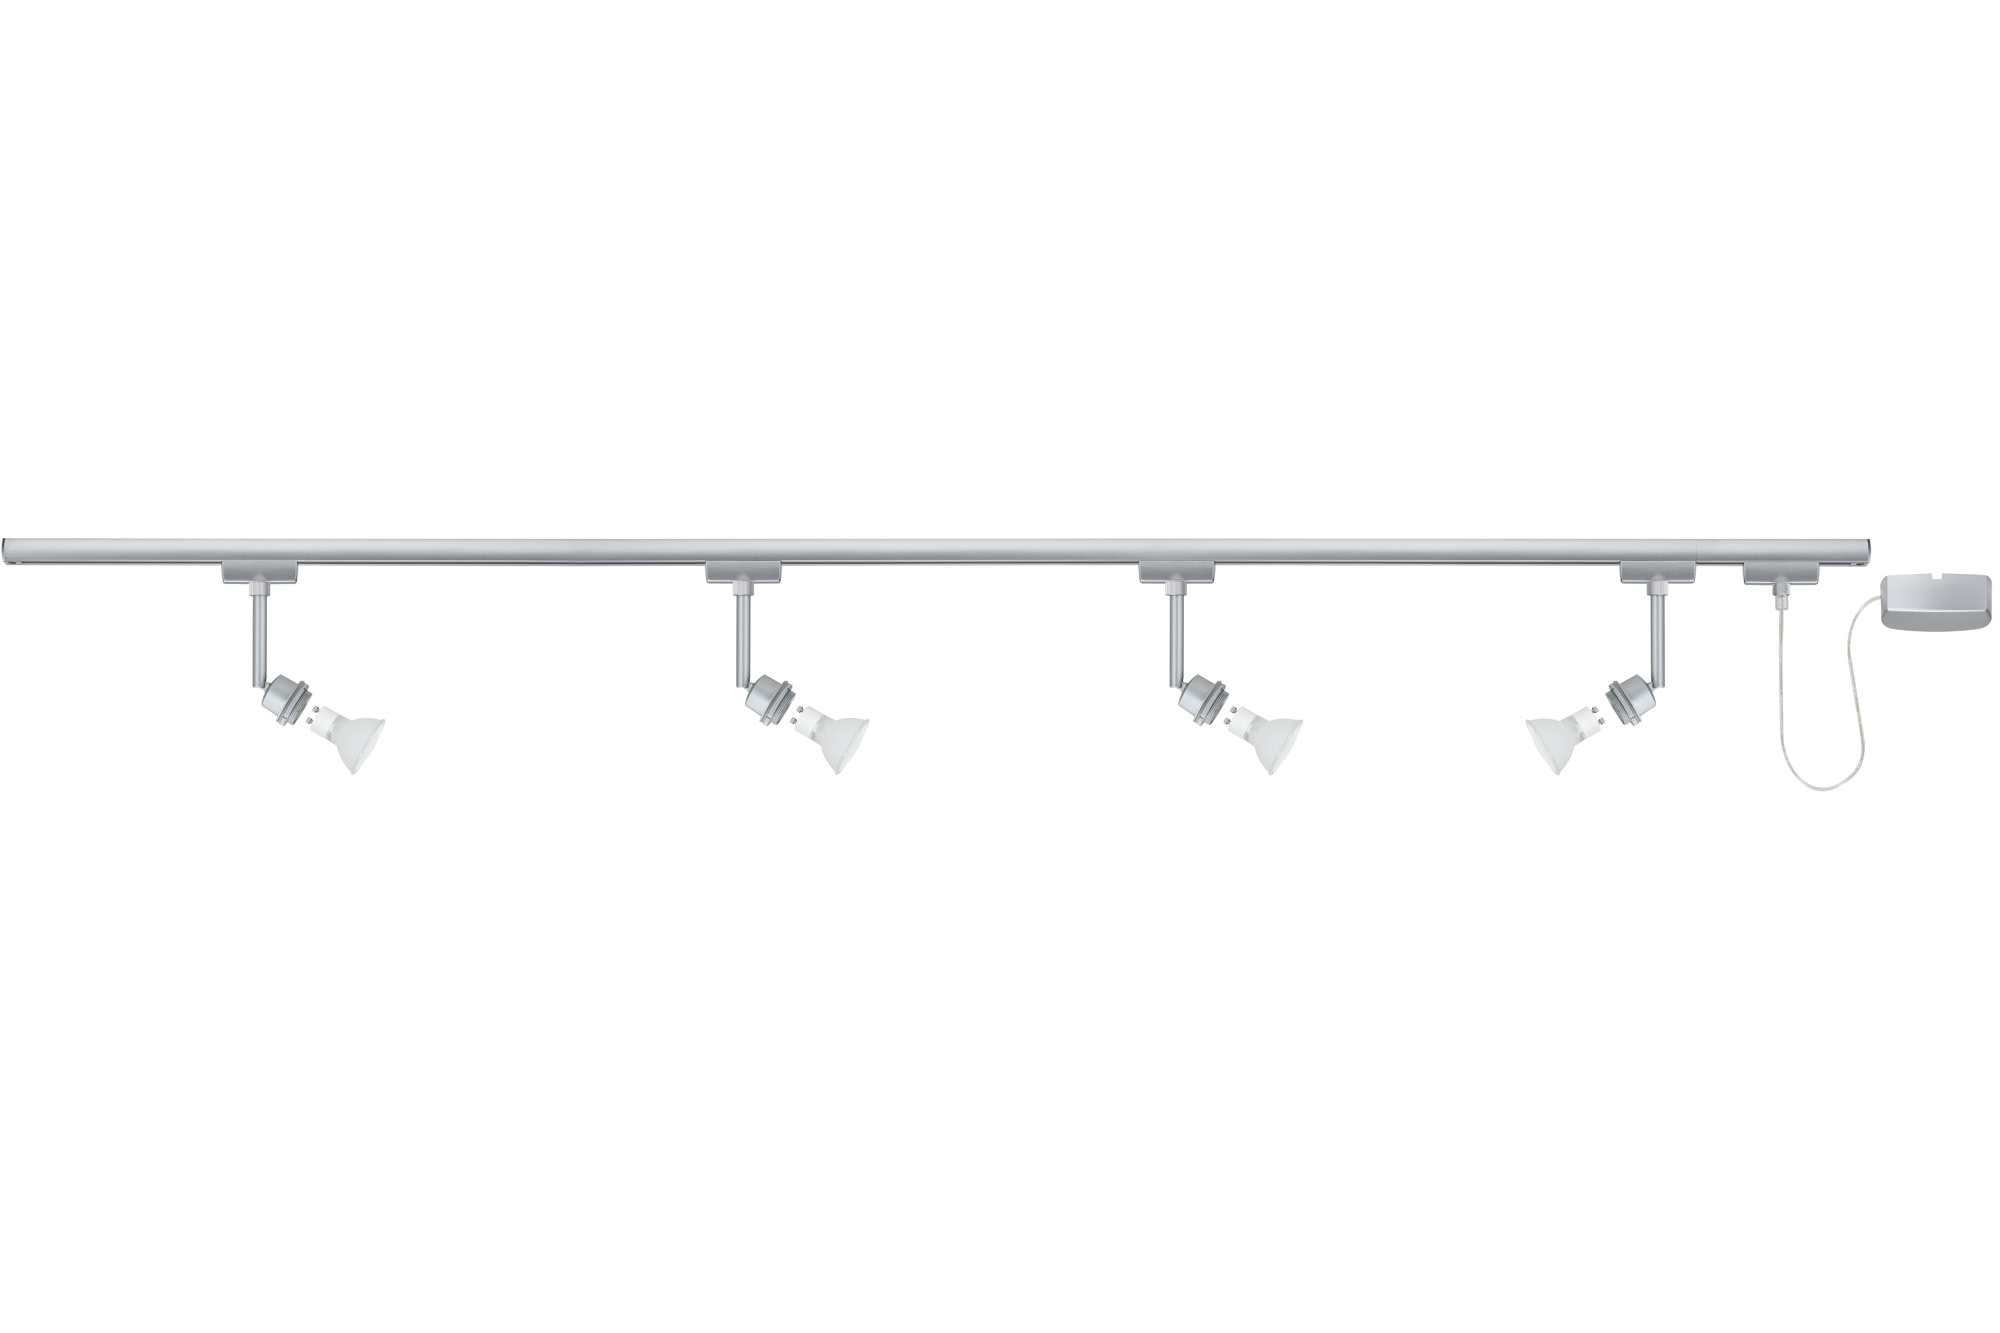 Paulmann. 95044 Набор светильников URail Basis 4x40W GZ10, хром матовый